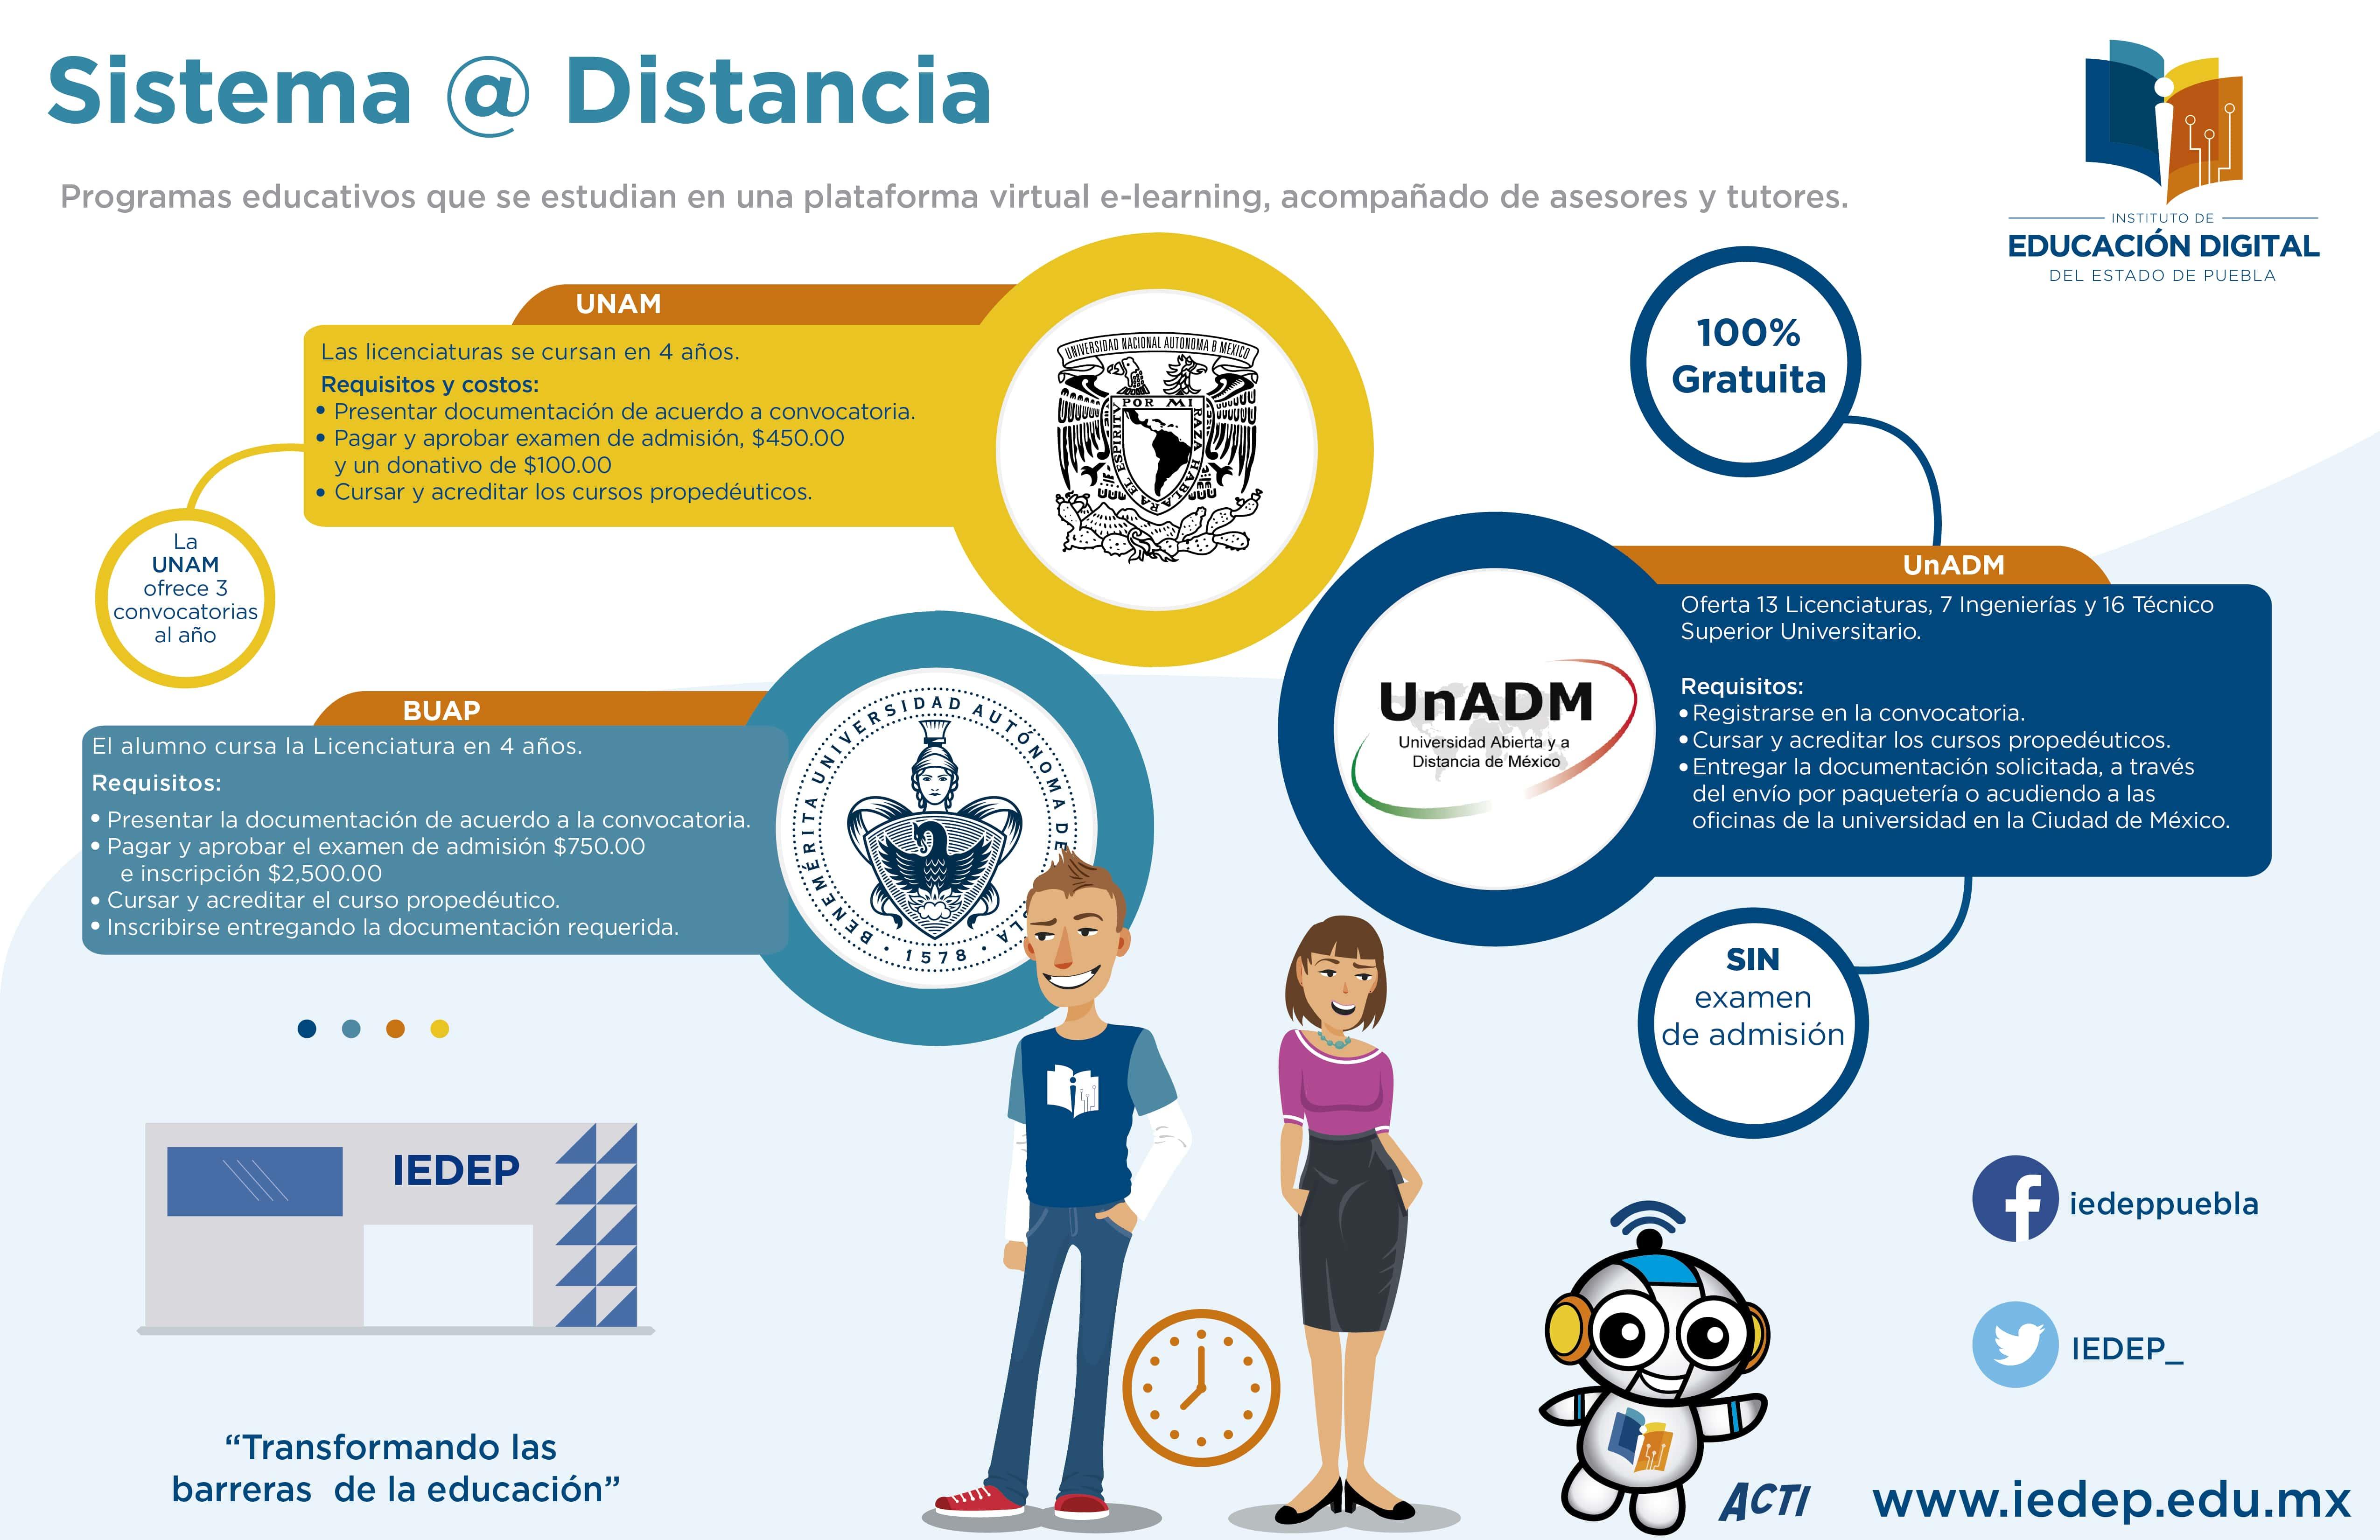 Sistema @ Distancia